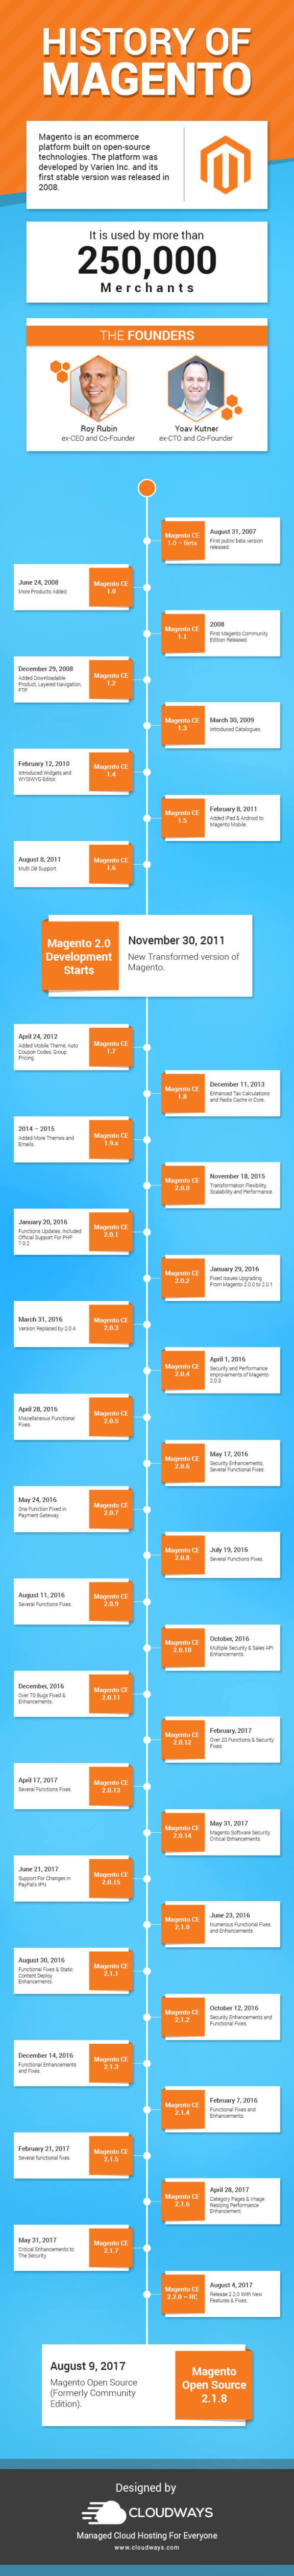 history-of-magento-infographic-galleryr